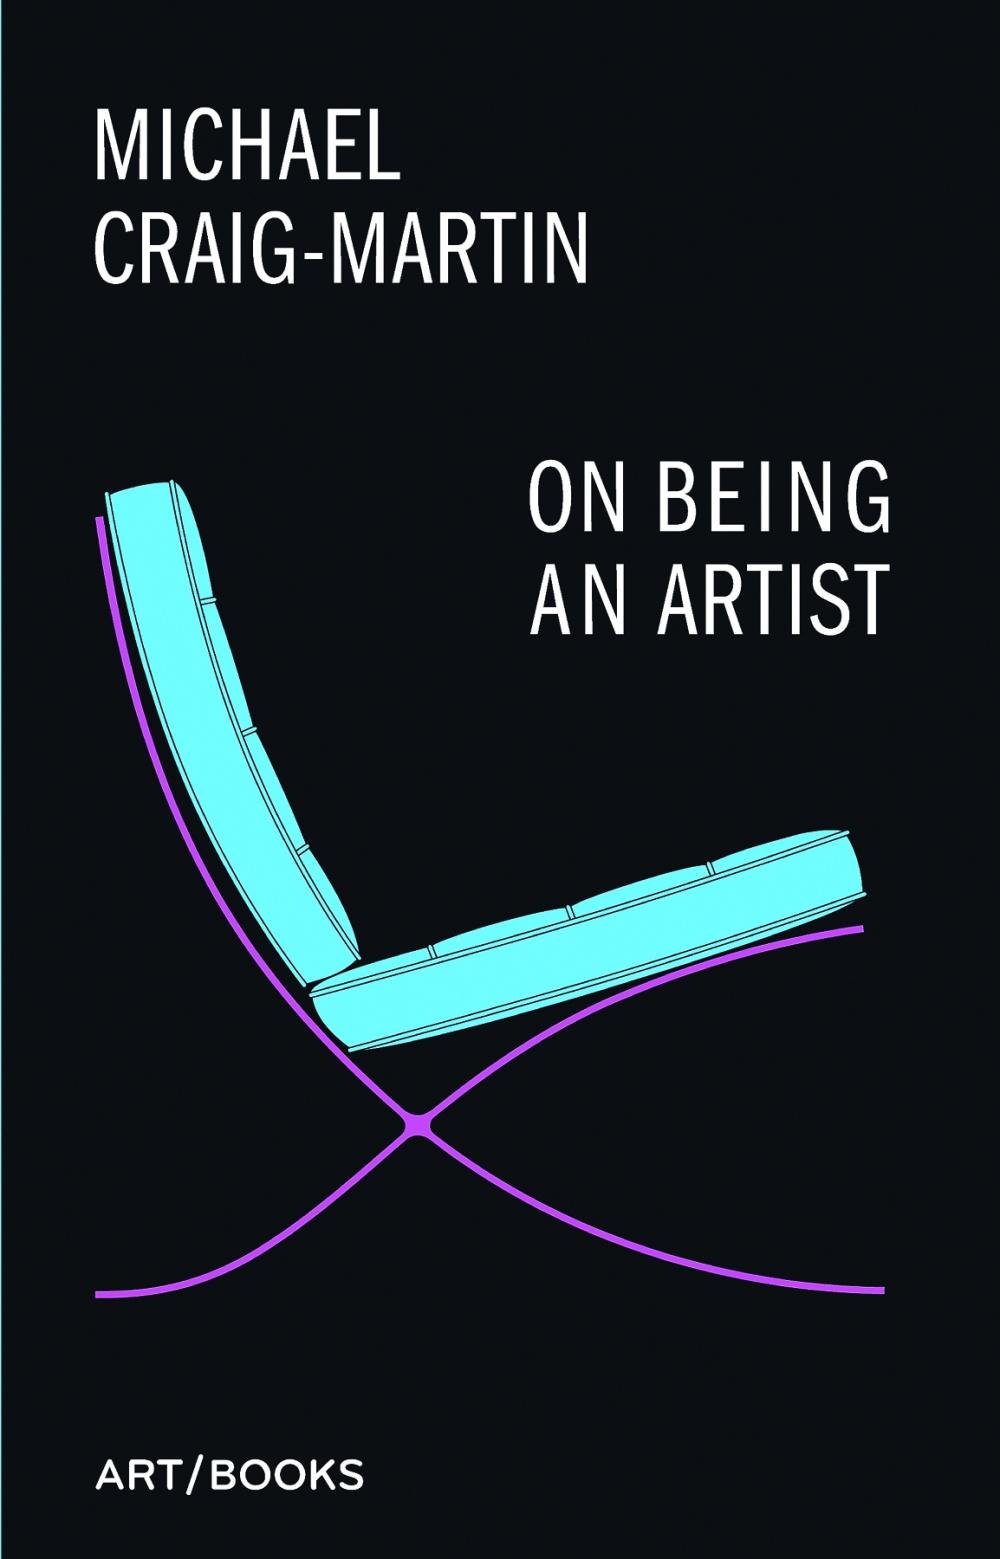 On Being an Artist